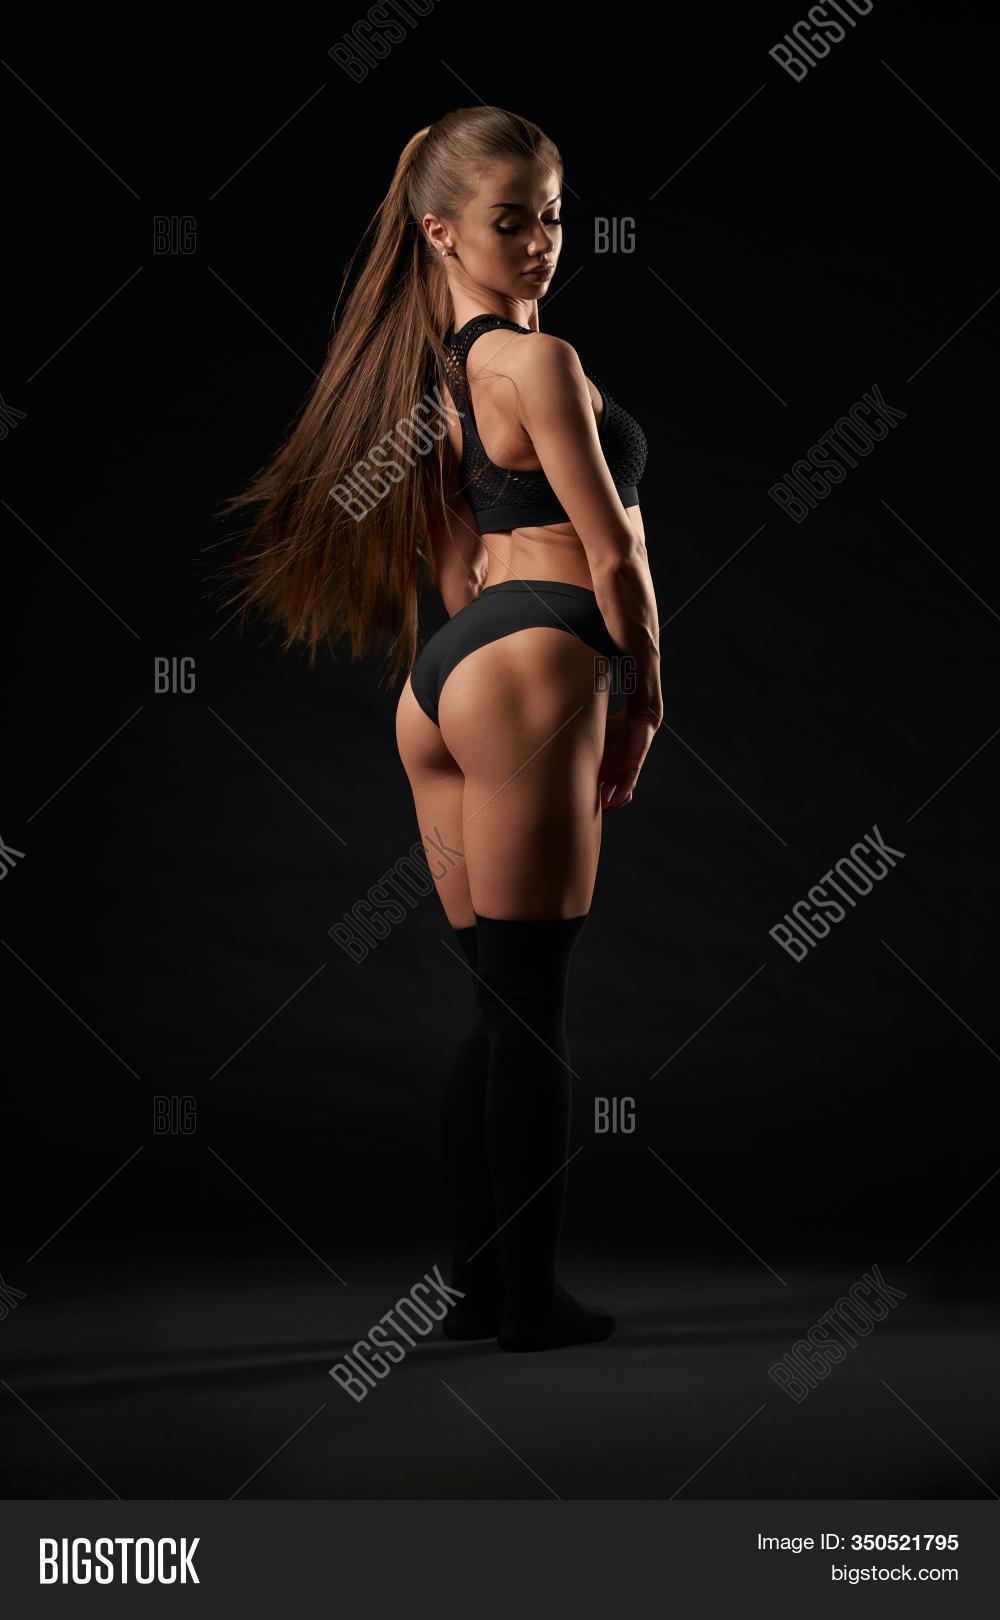 Ponytails And Black Panties HD